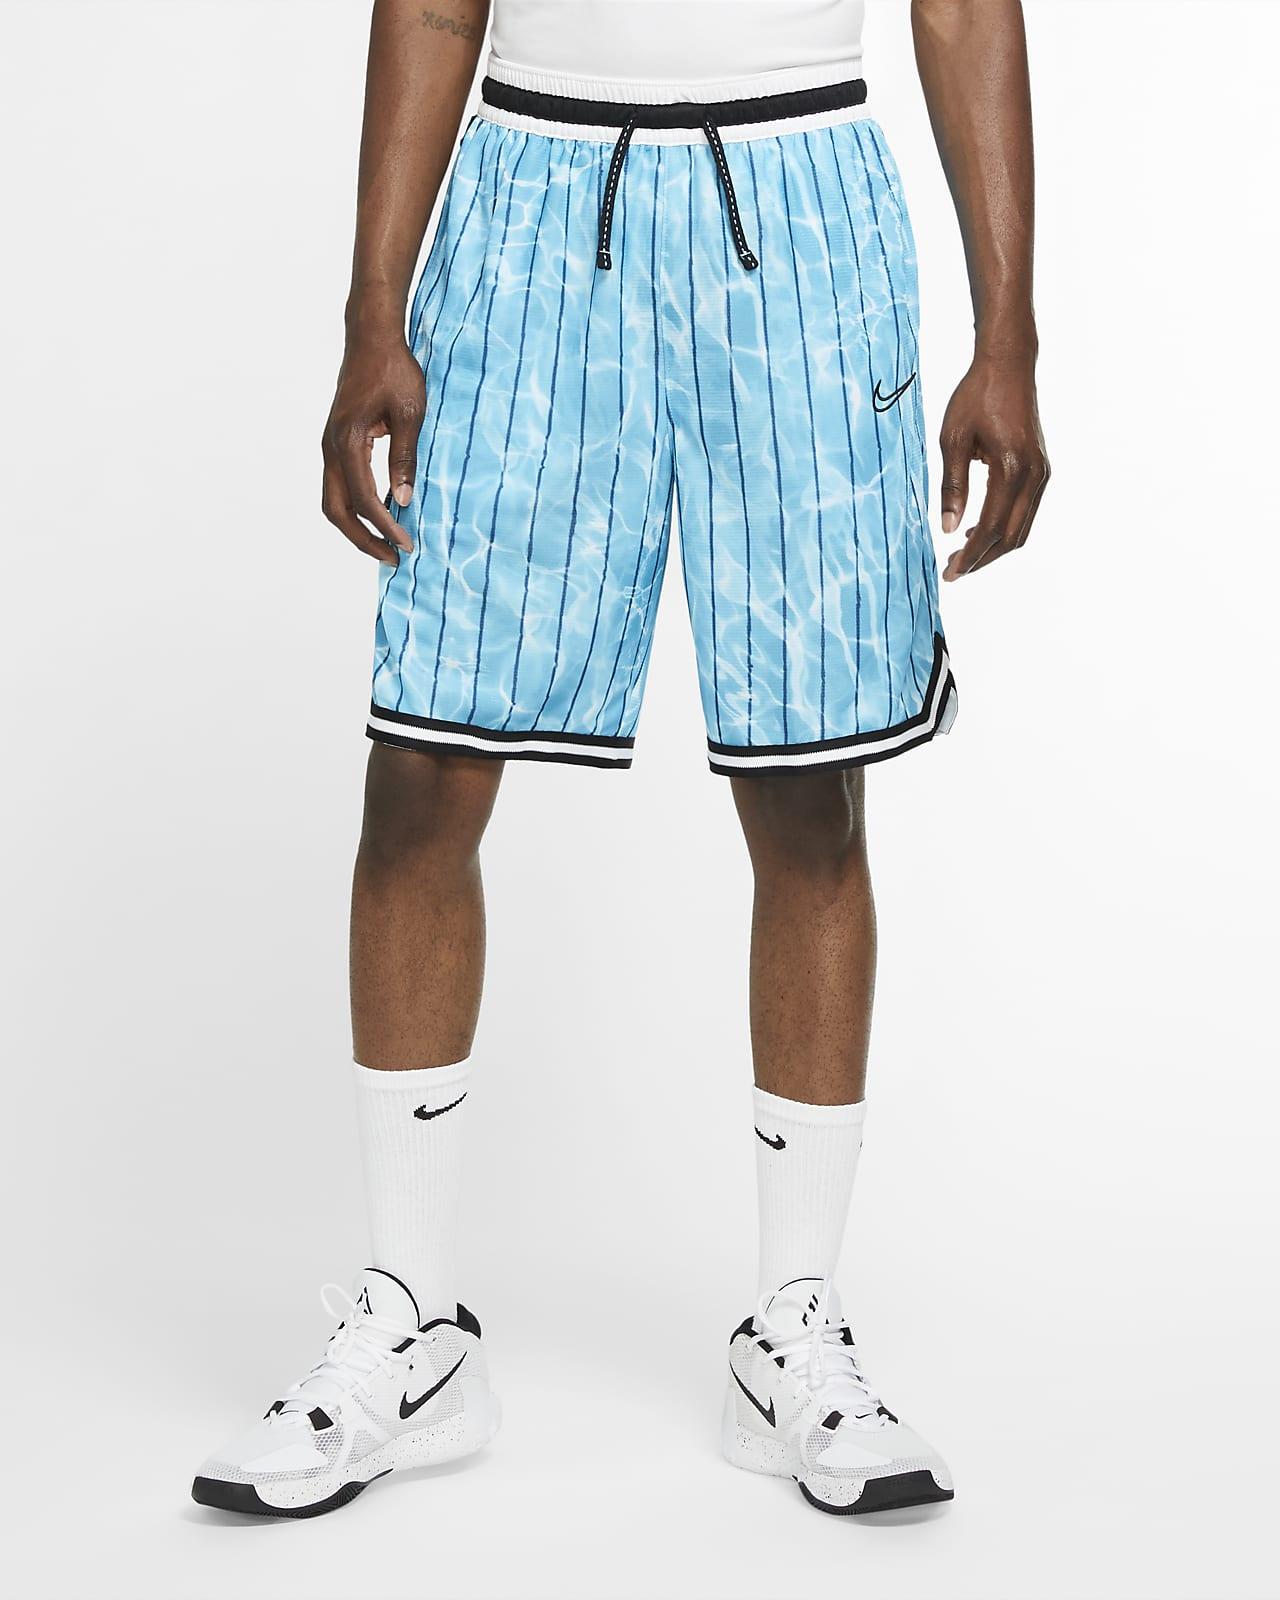 Shorts de básquetbol para hombre Nike DNA Exploration Series